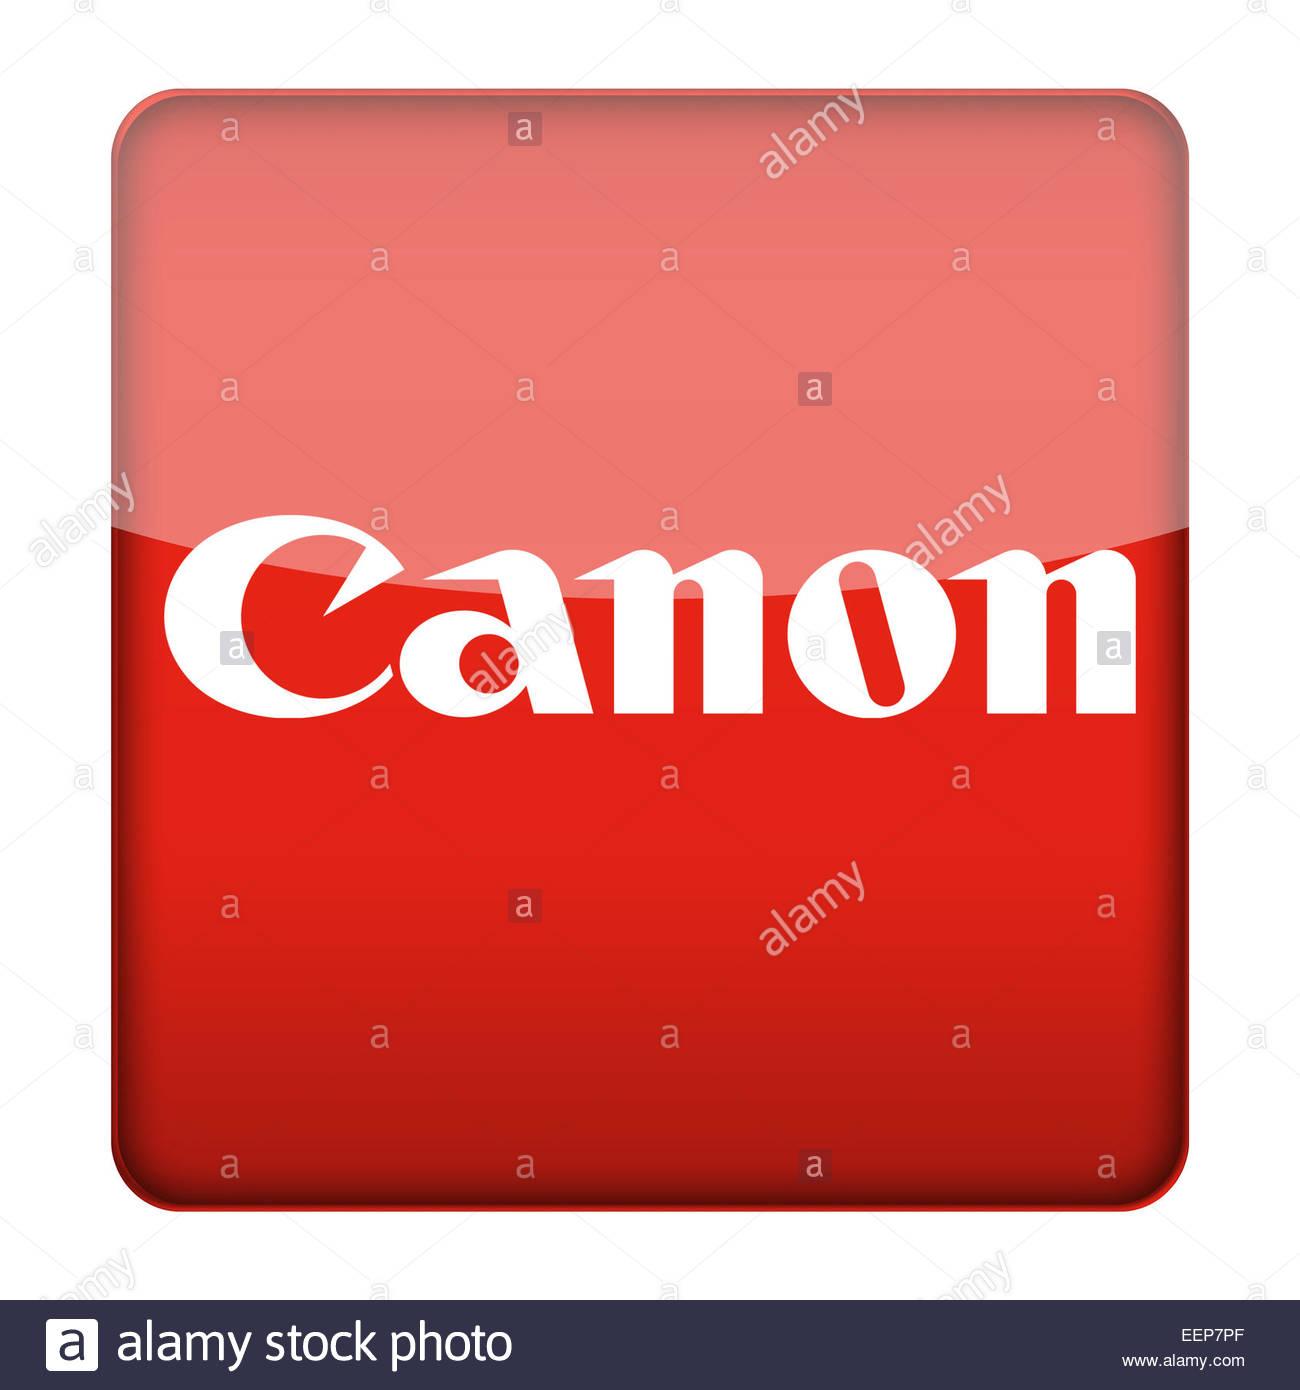 canon logo icon stock photo royalty free image 77935719